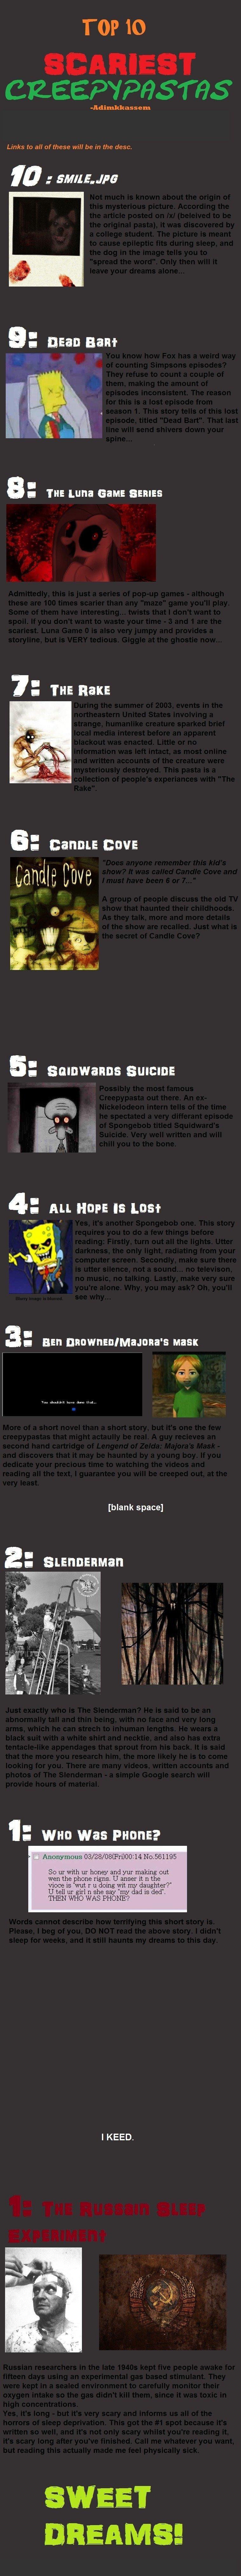 Top 10 Creepypasta's. Smile.jpg: knowyourmeme.com/memes/smilejpg#.Tquaed4r2so Dead Bart: creepypasta.wikia.com/wiki/DeadBart The Luna Game Series: knowyourmeme. Top 10 Creepypasta's Smile jpg: knowyourmeme com/memes/smilejpg# Tquaed4r2so Dead Bart: creepypasta wikia com/wiki/DeadBart The Luna Game Series: